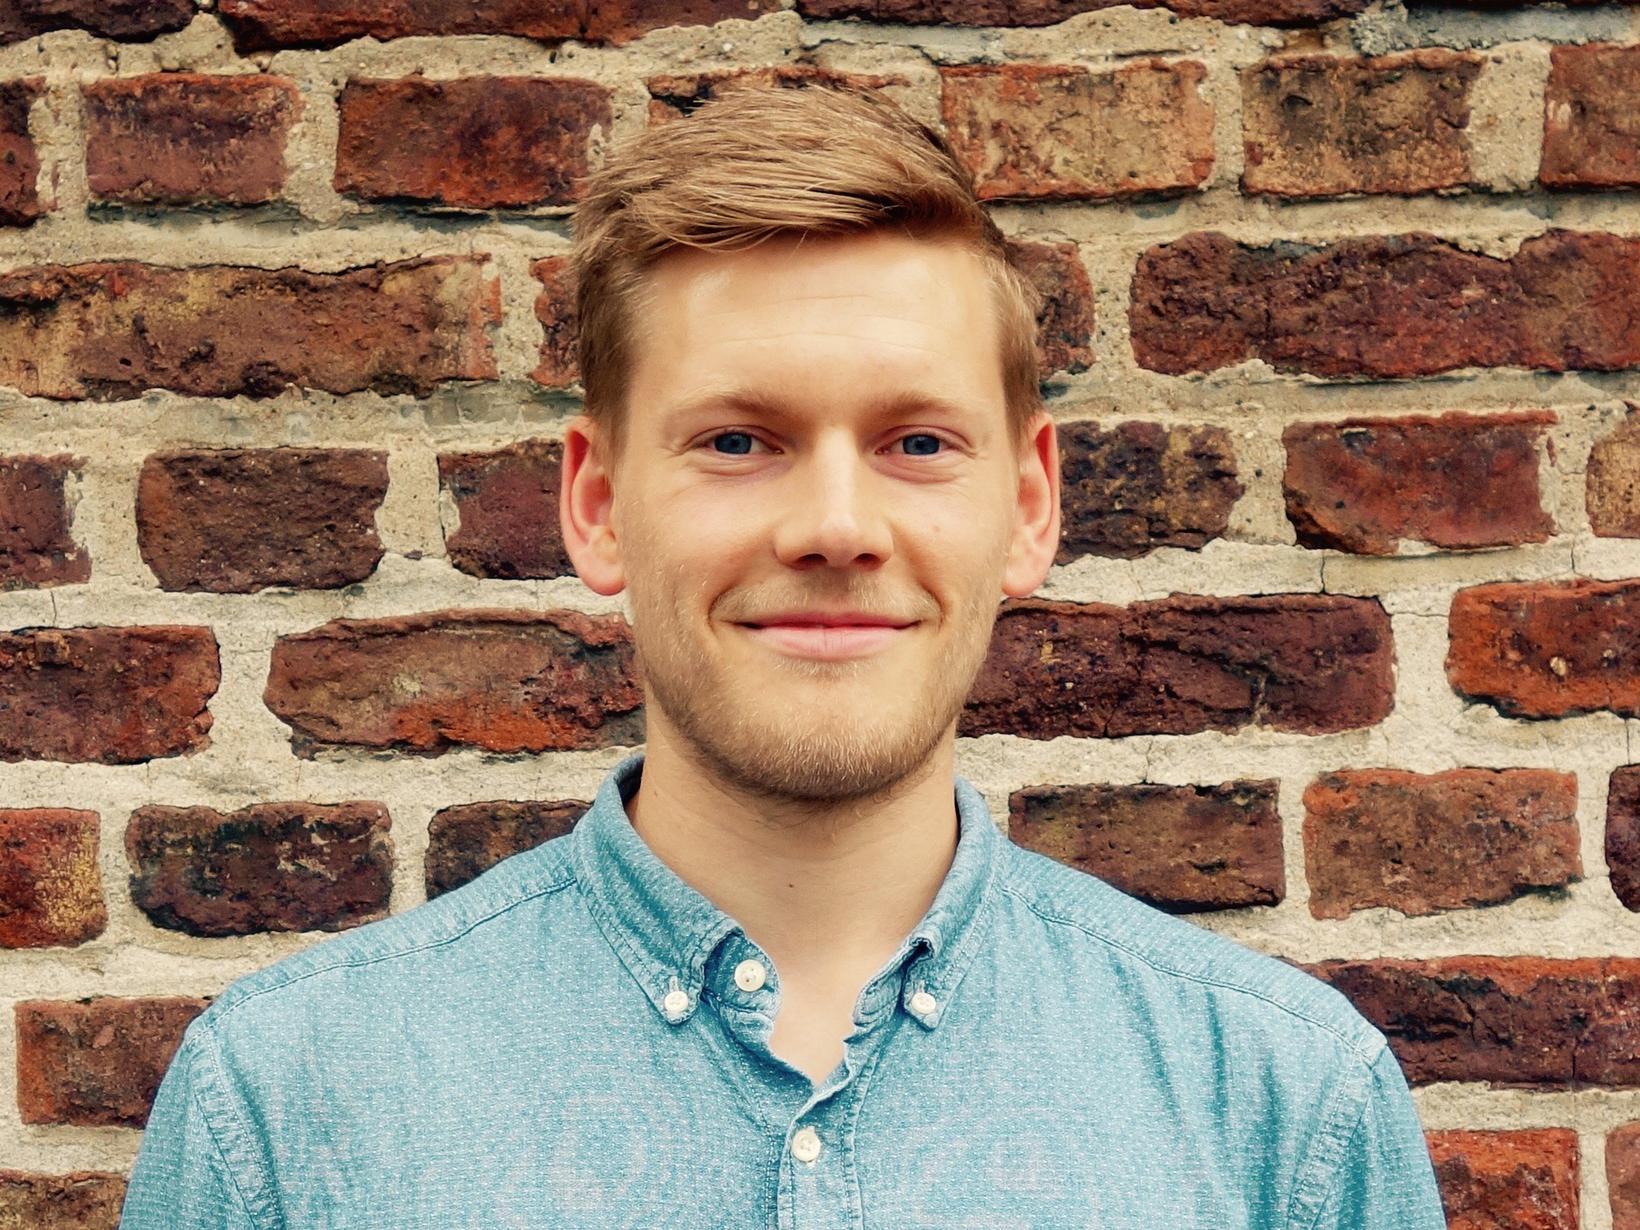 Jan-niklas from Köln, Germany